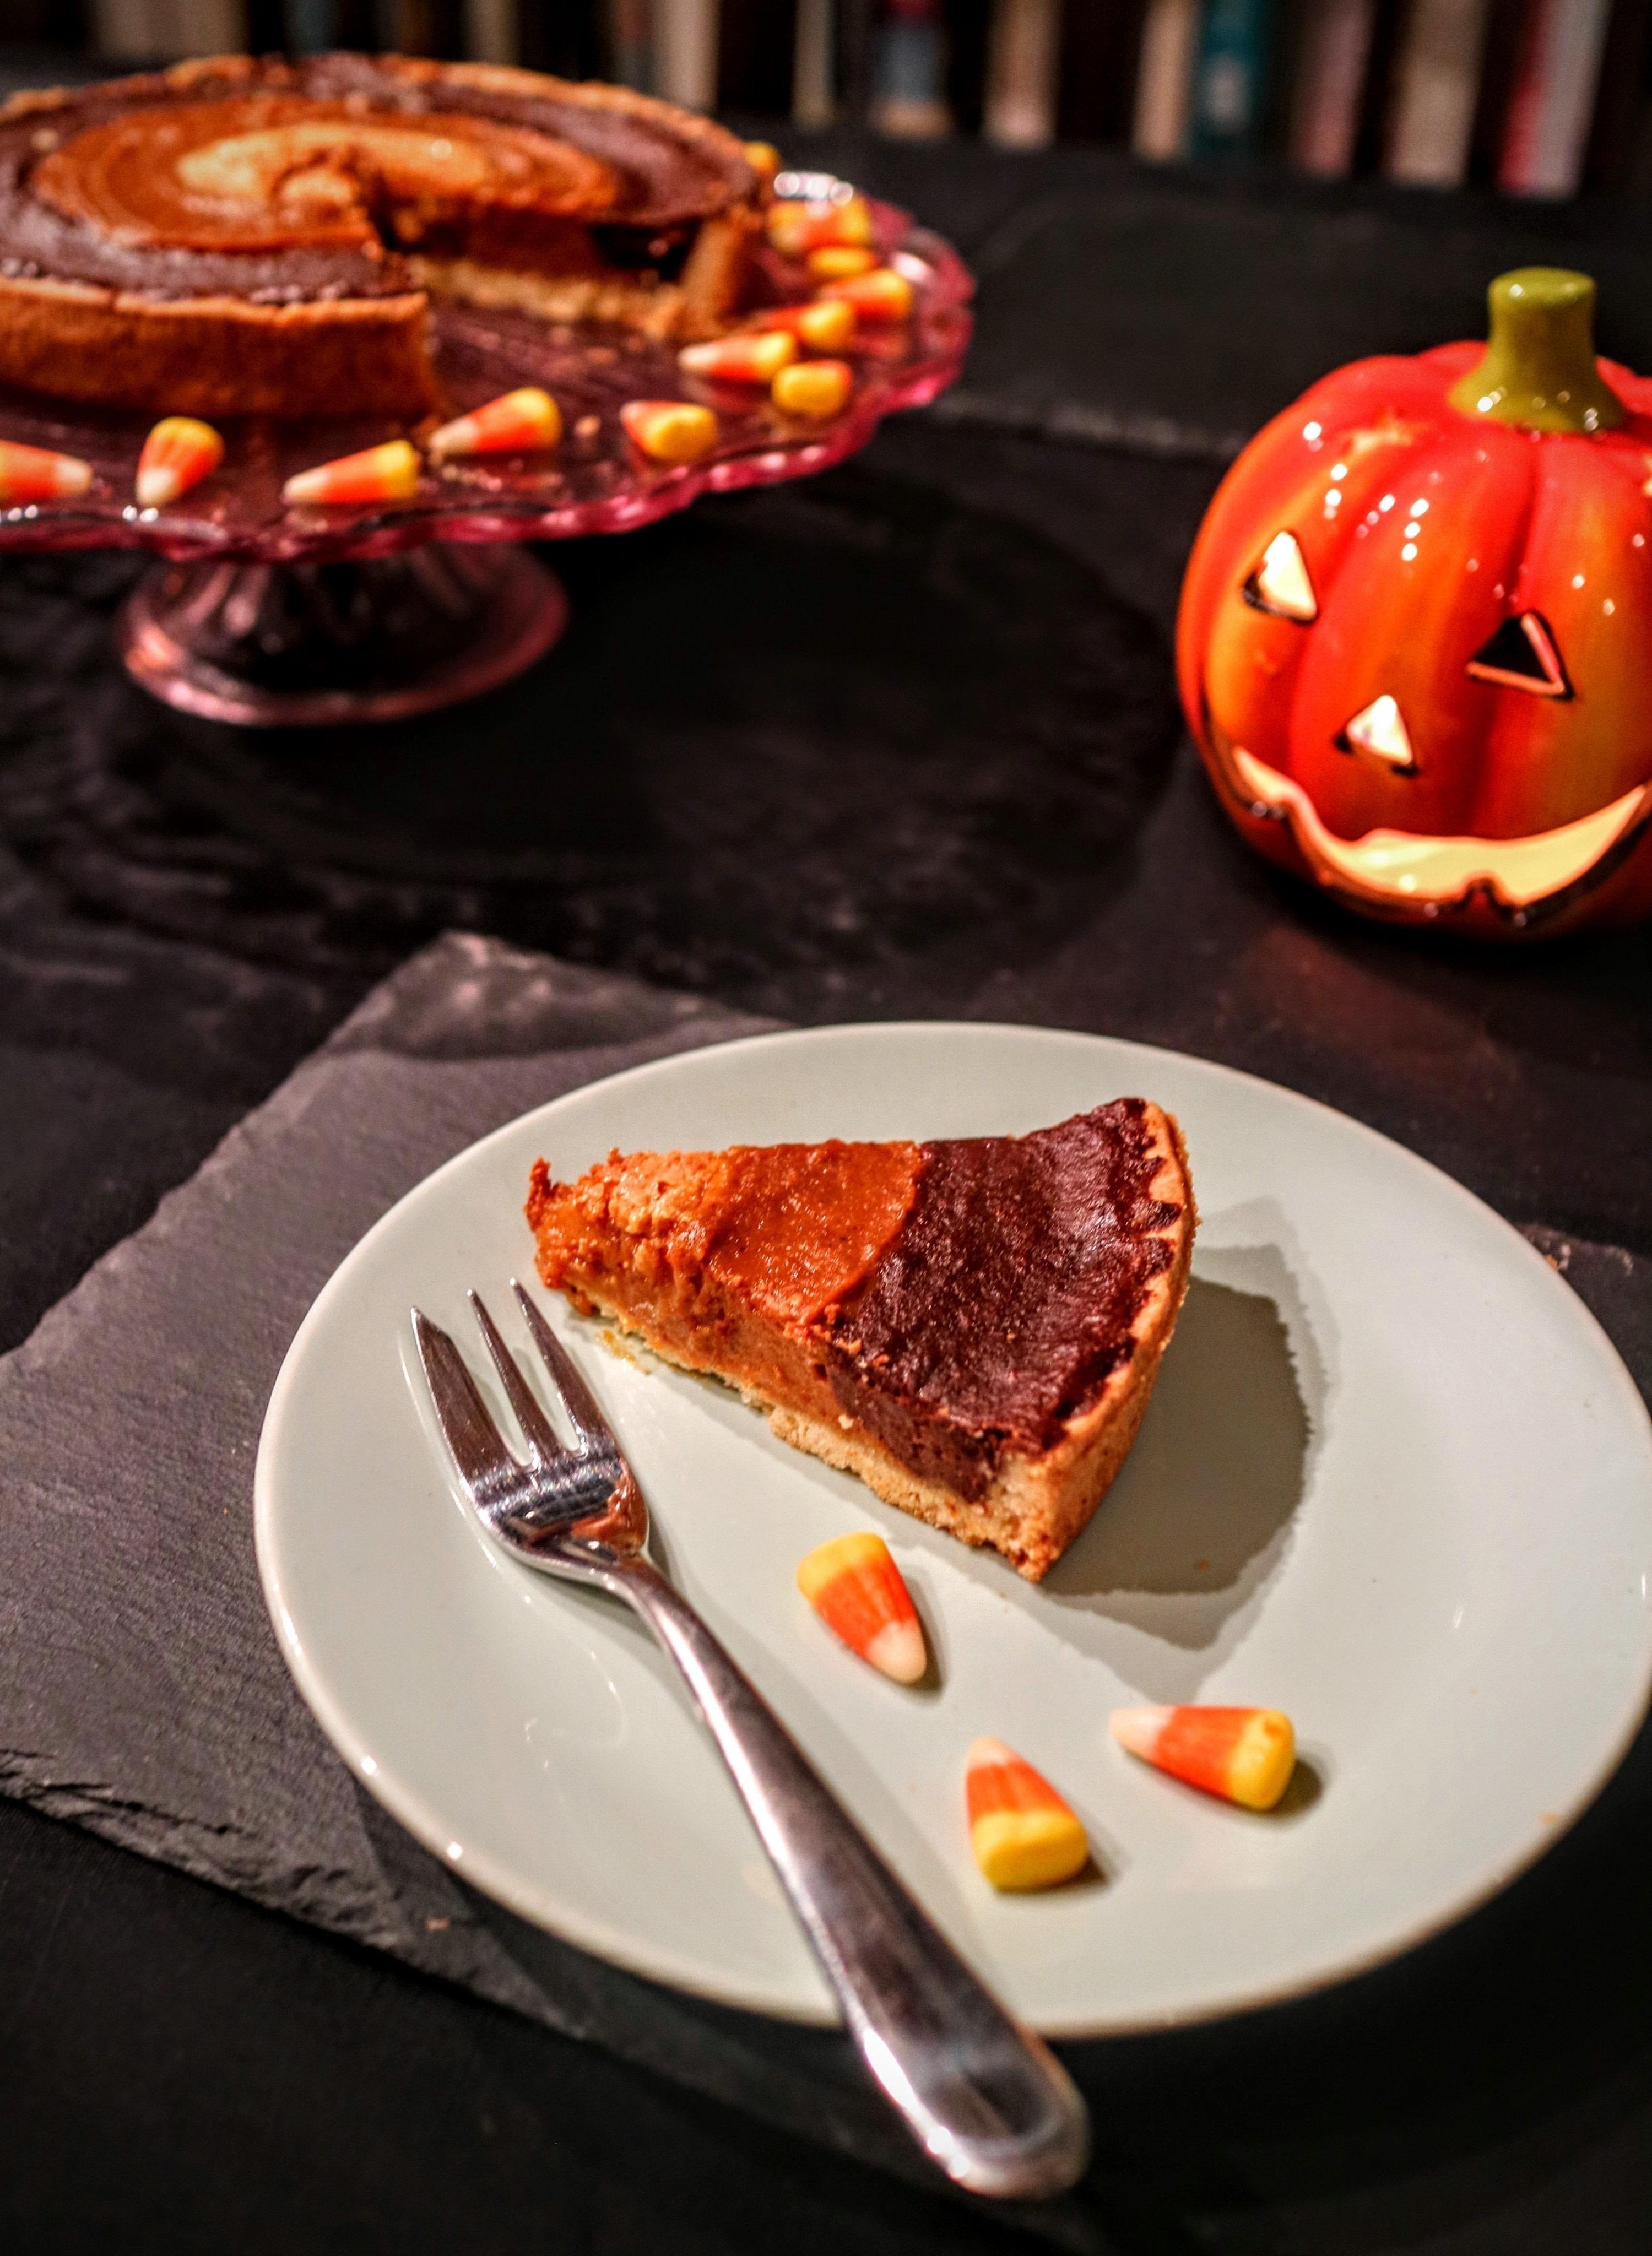 Candy Corn Pumpkin Pie 183 How To Bake A Pumpkin Pie 183 Recipes On Cut Out Keep